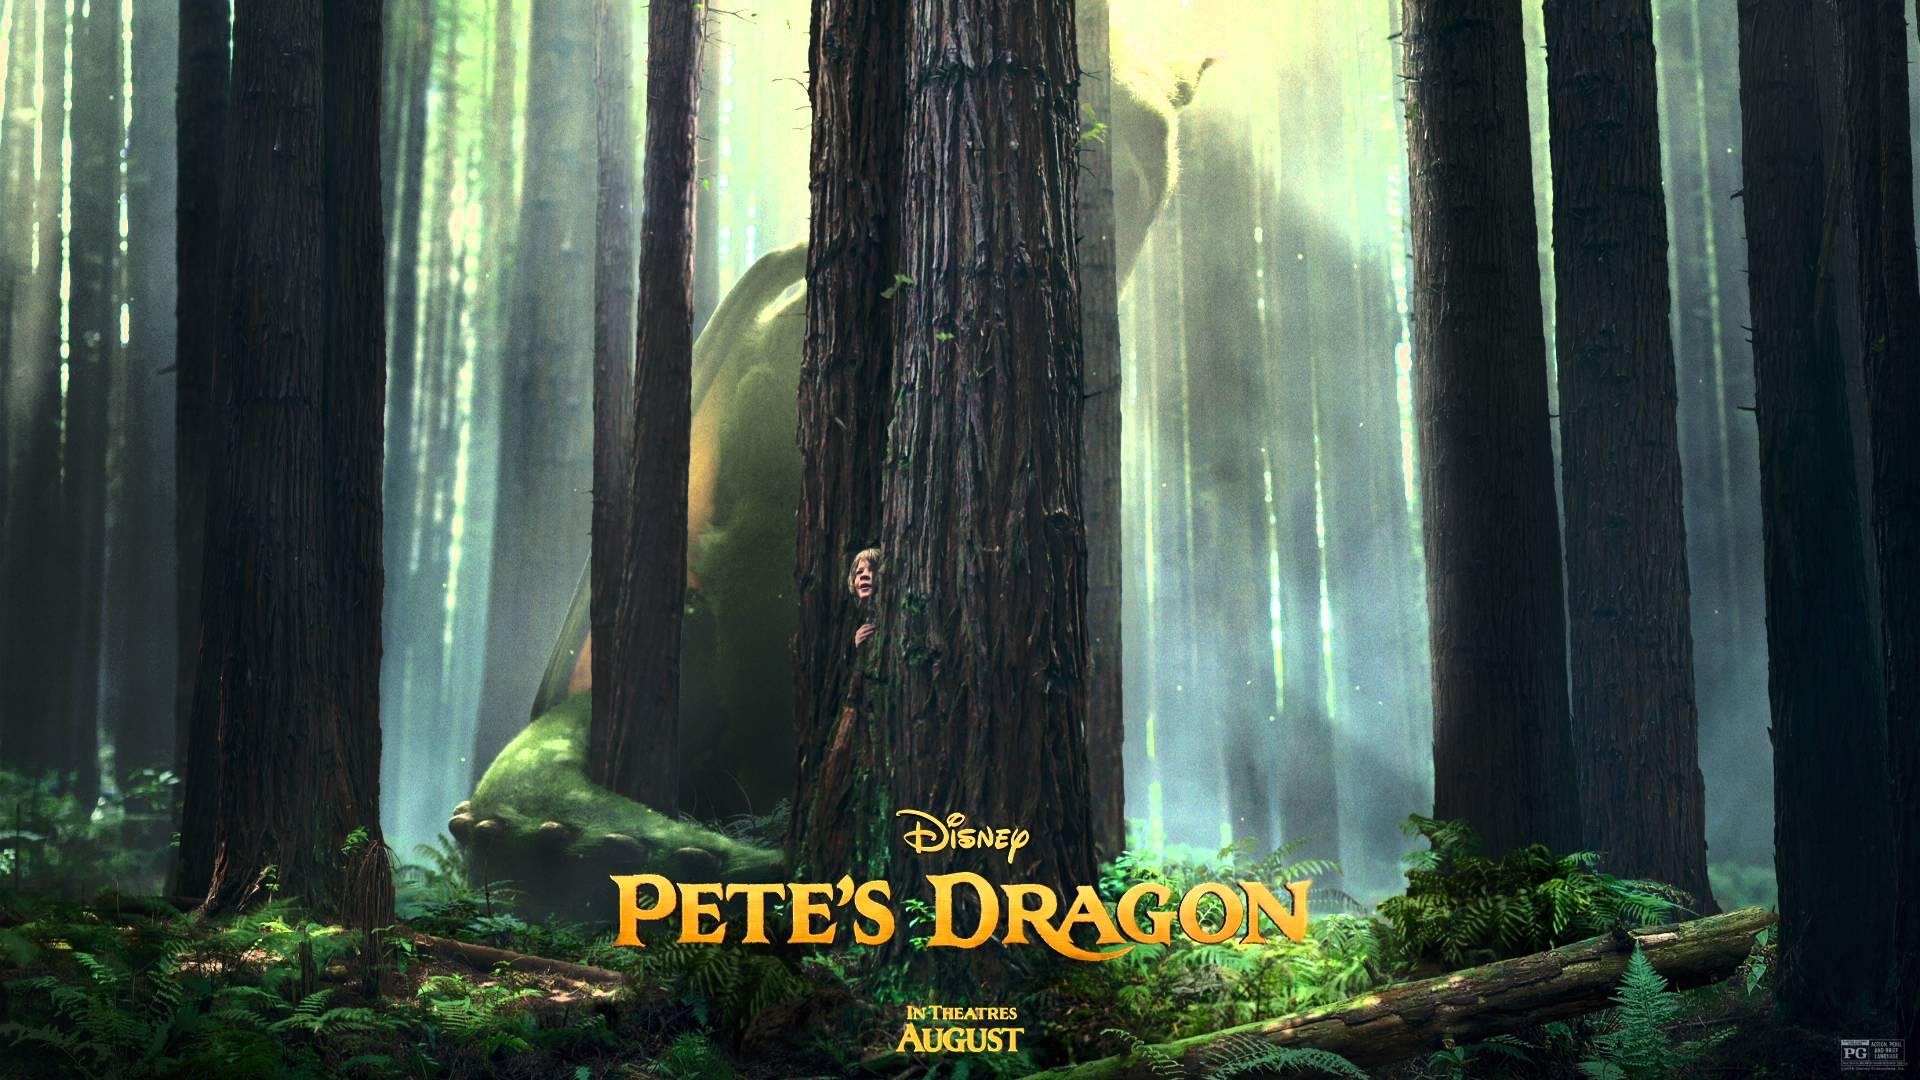 Pete's Dragon Reboot – First Teaser Trailer